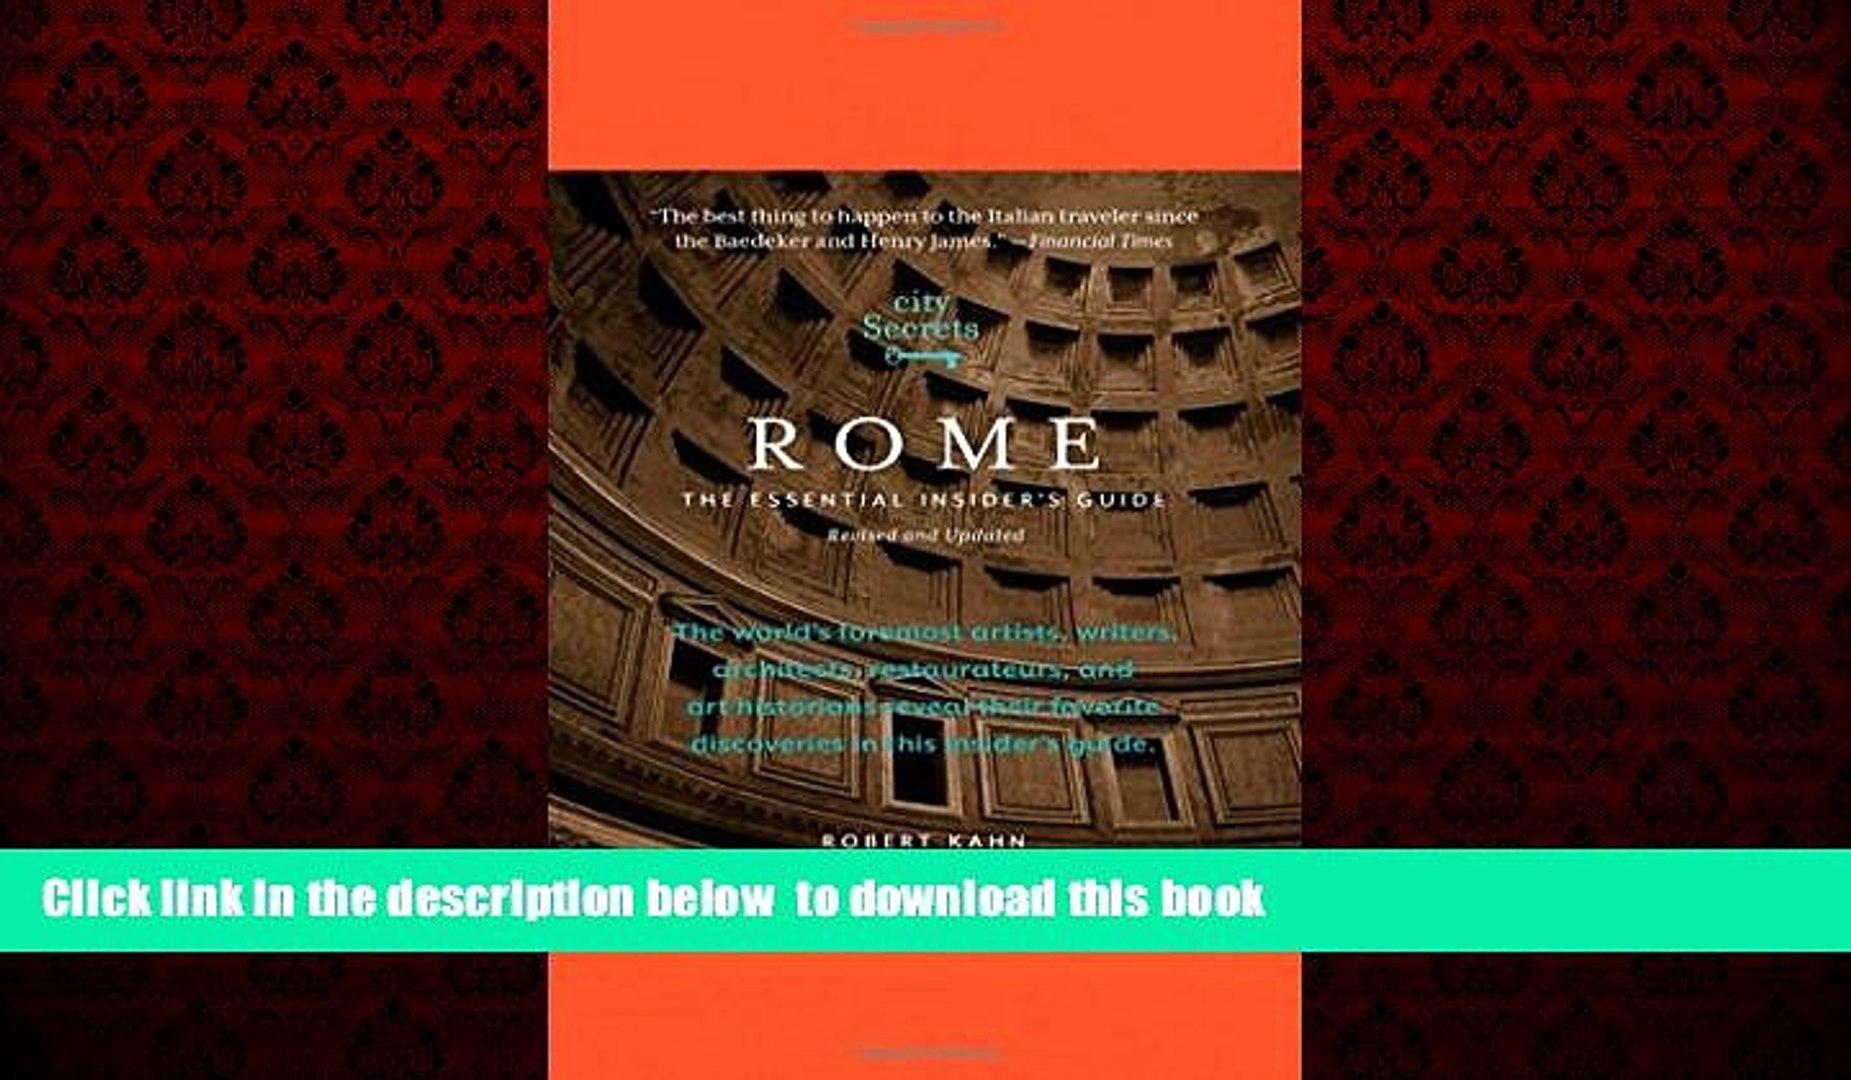 City Secrets Rome: The Essential Insiders Guide